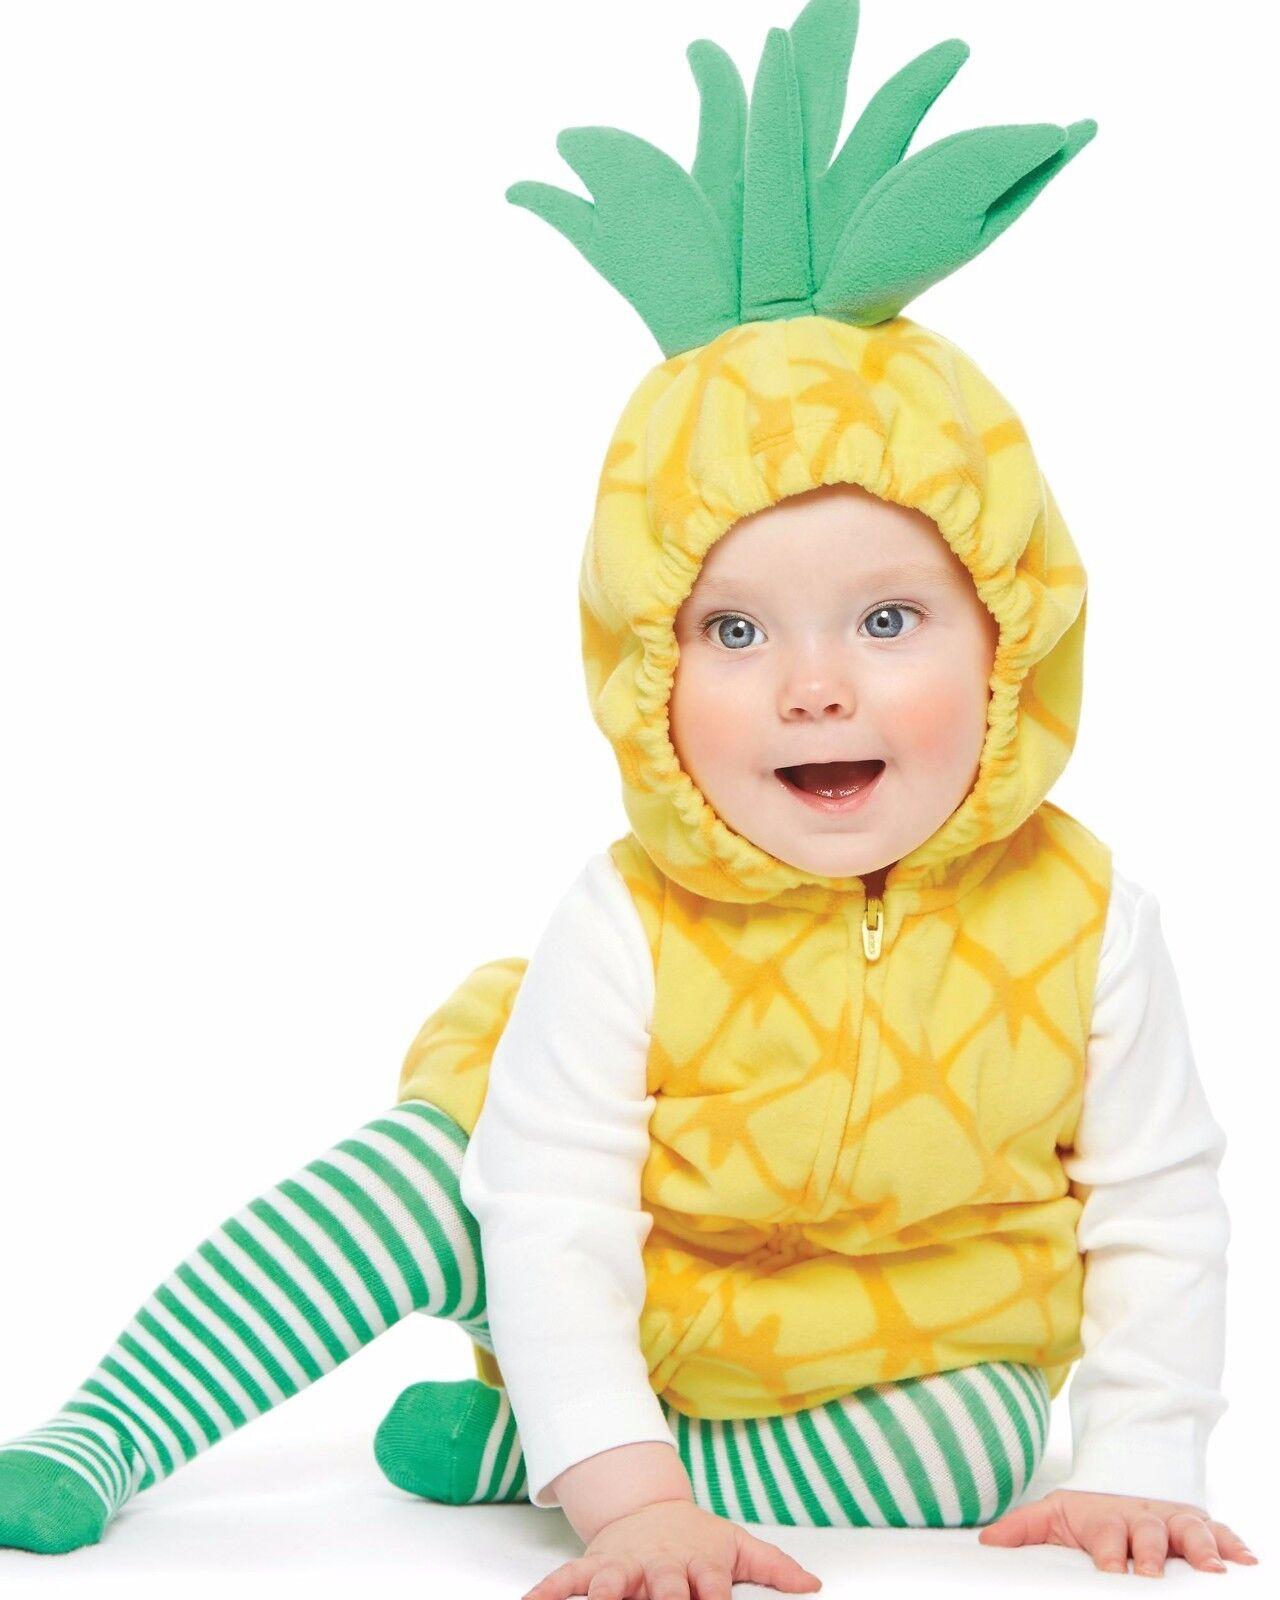 carter's pineapple baby girl's halloween costume 3pc 12 months | ebay